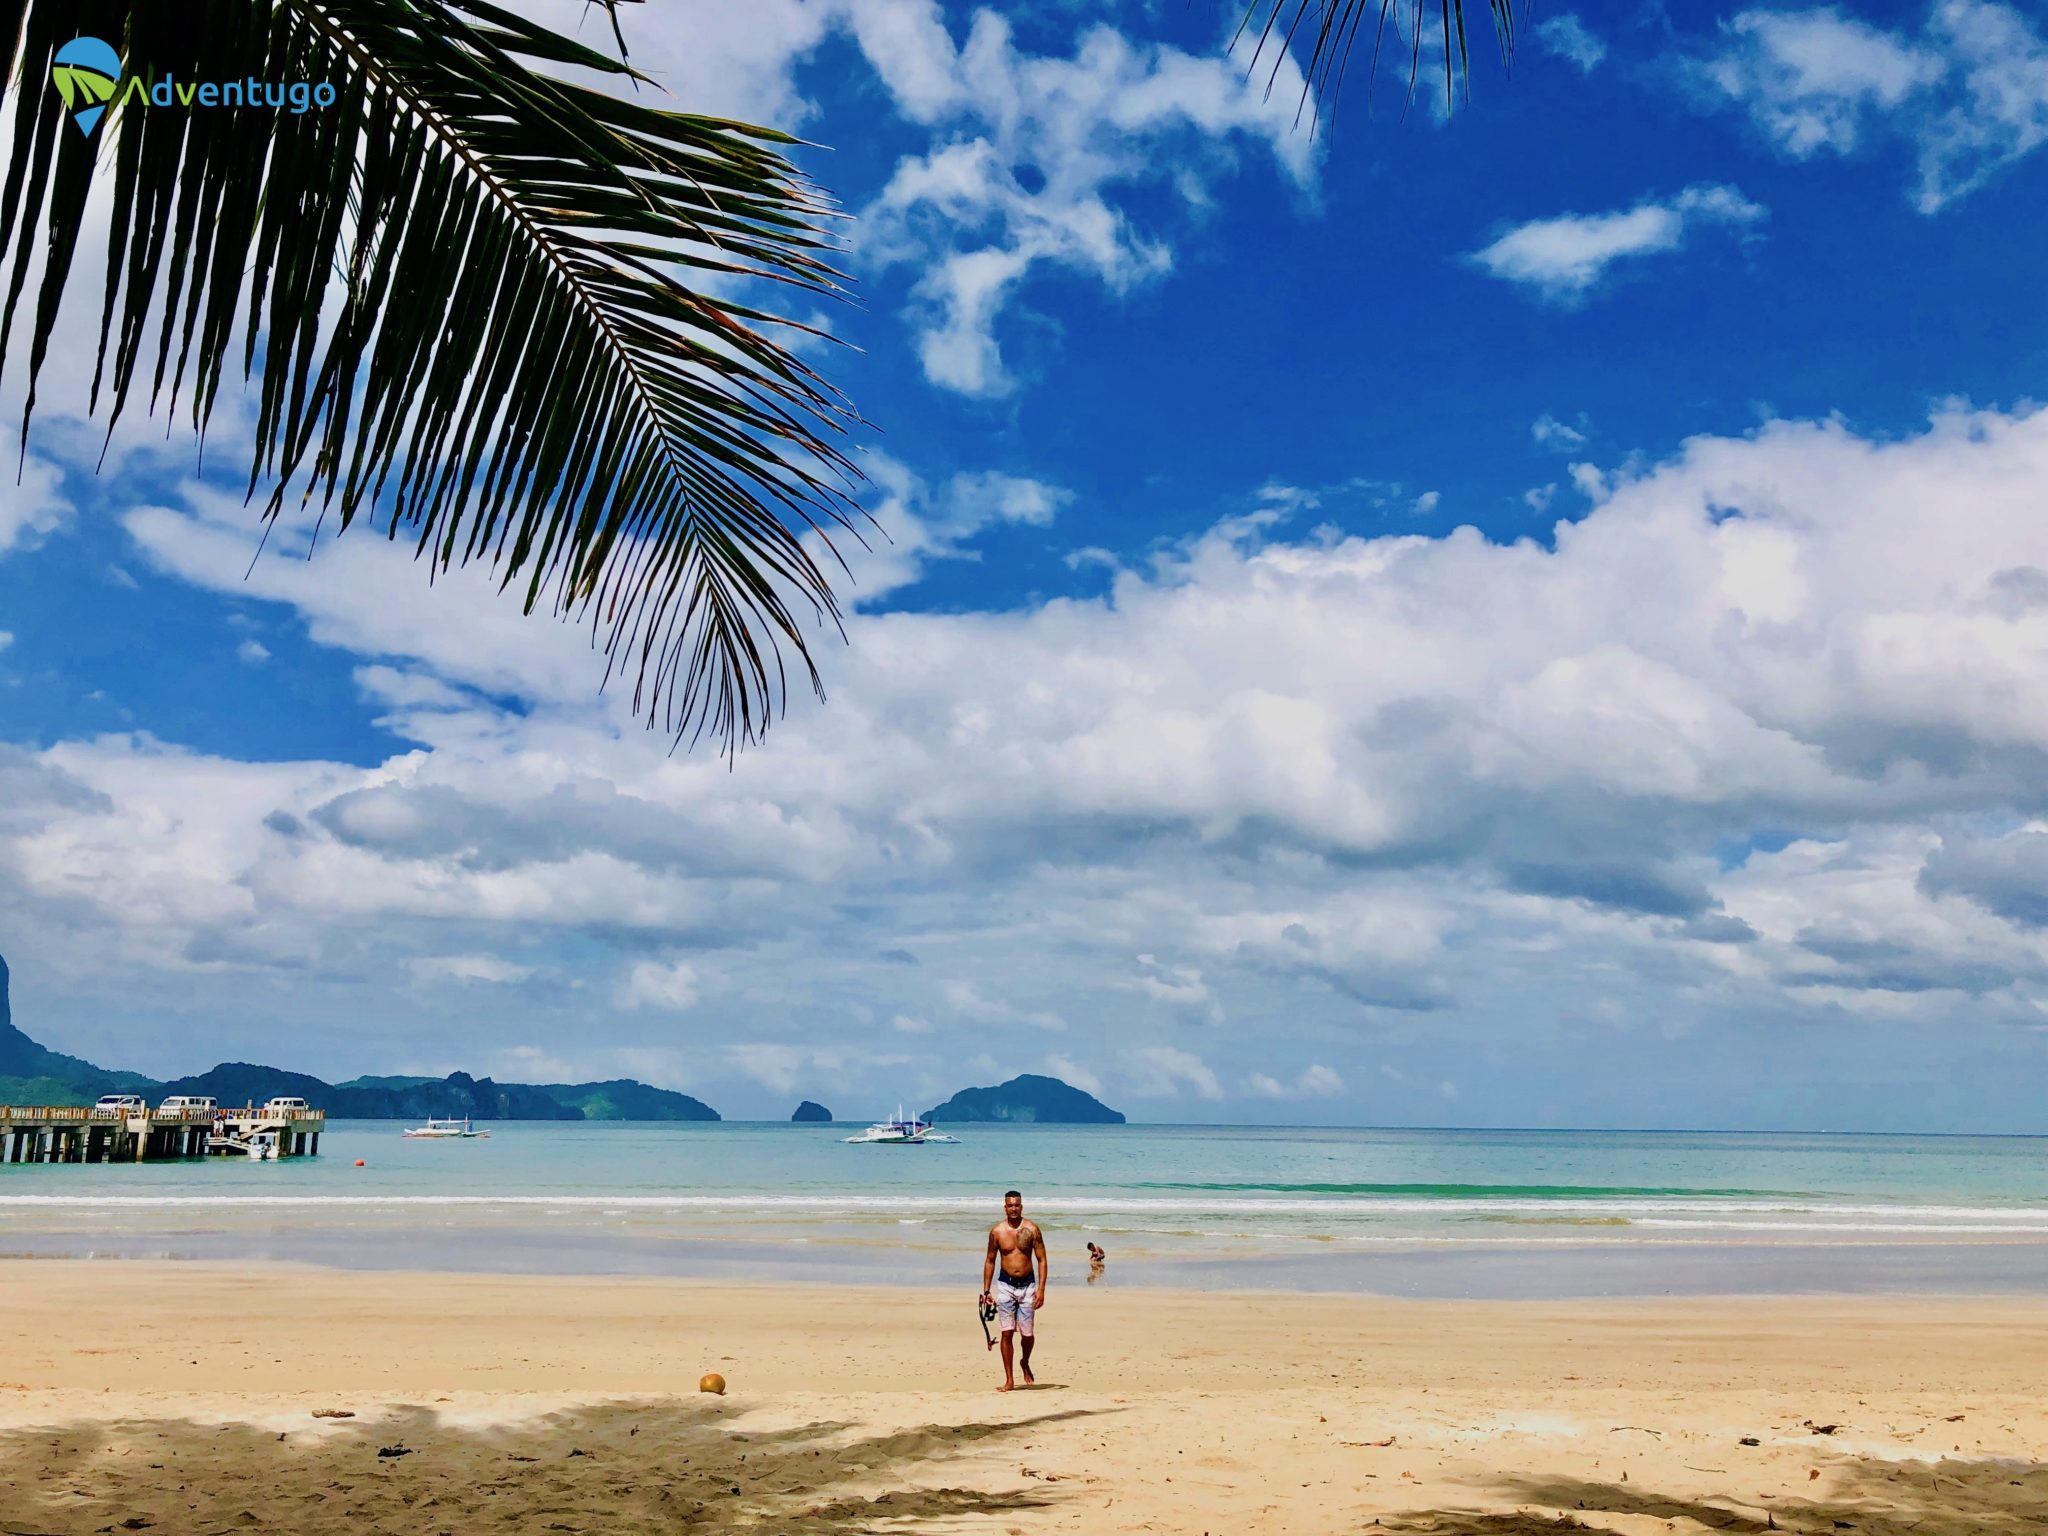 Airport Beach El Nido Lio properties